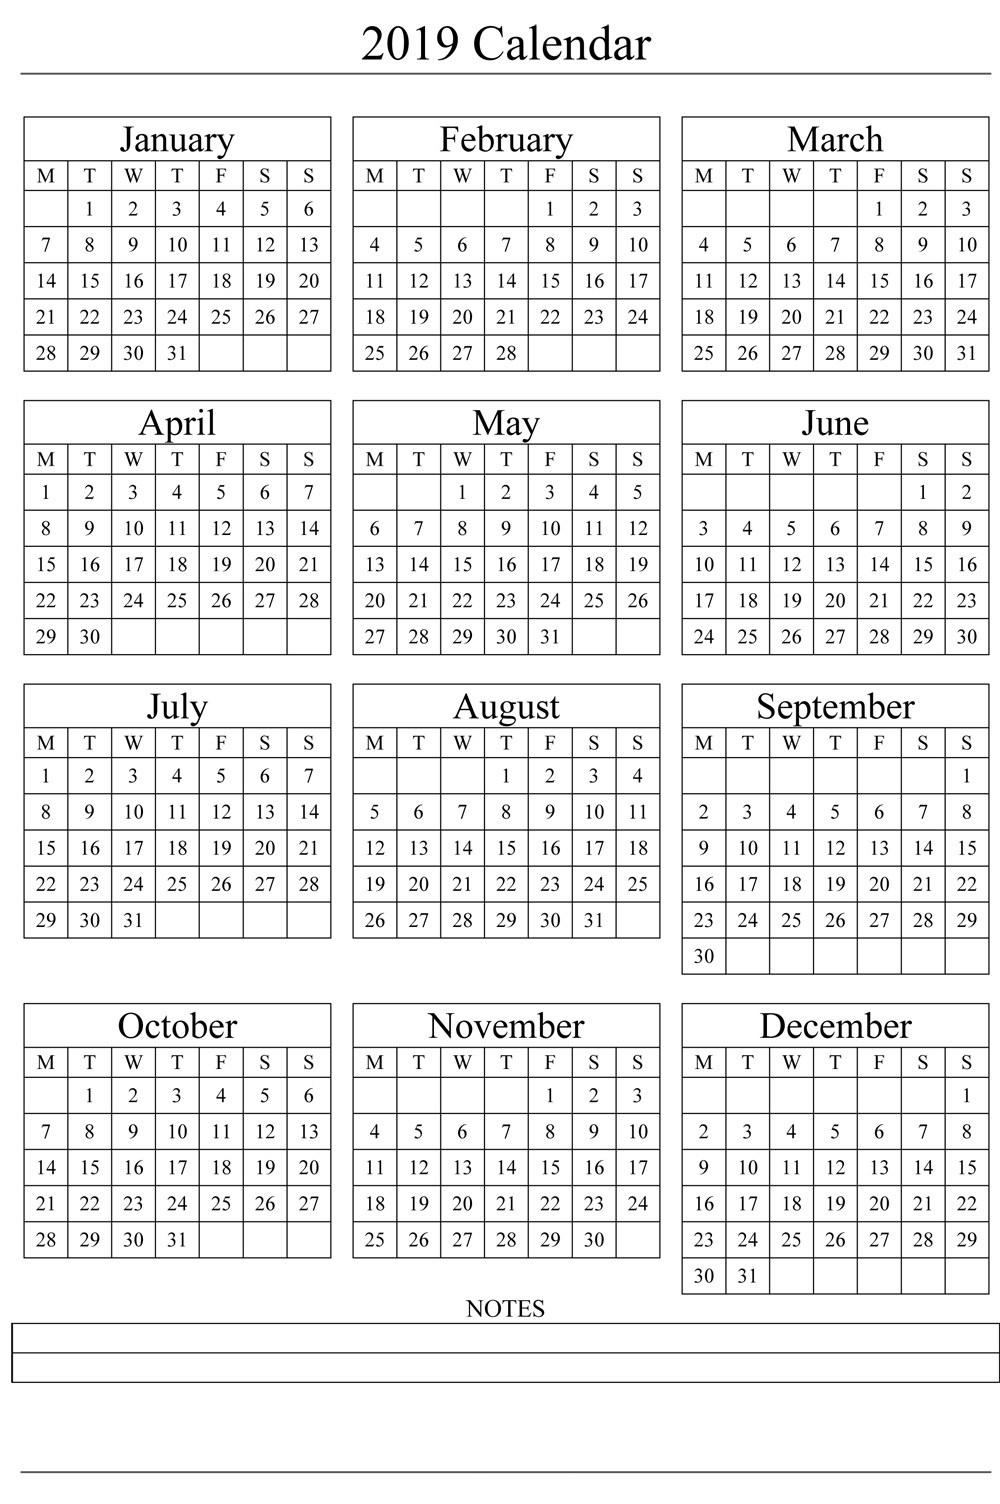 2019 Printable Calendar Templates - Blank Word Pdf - Calendar End